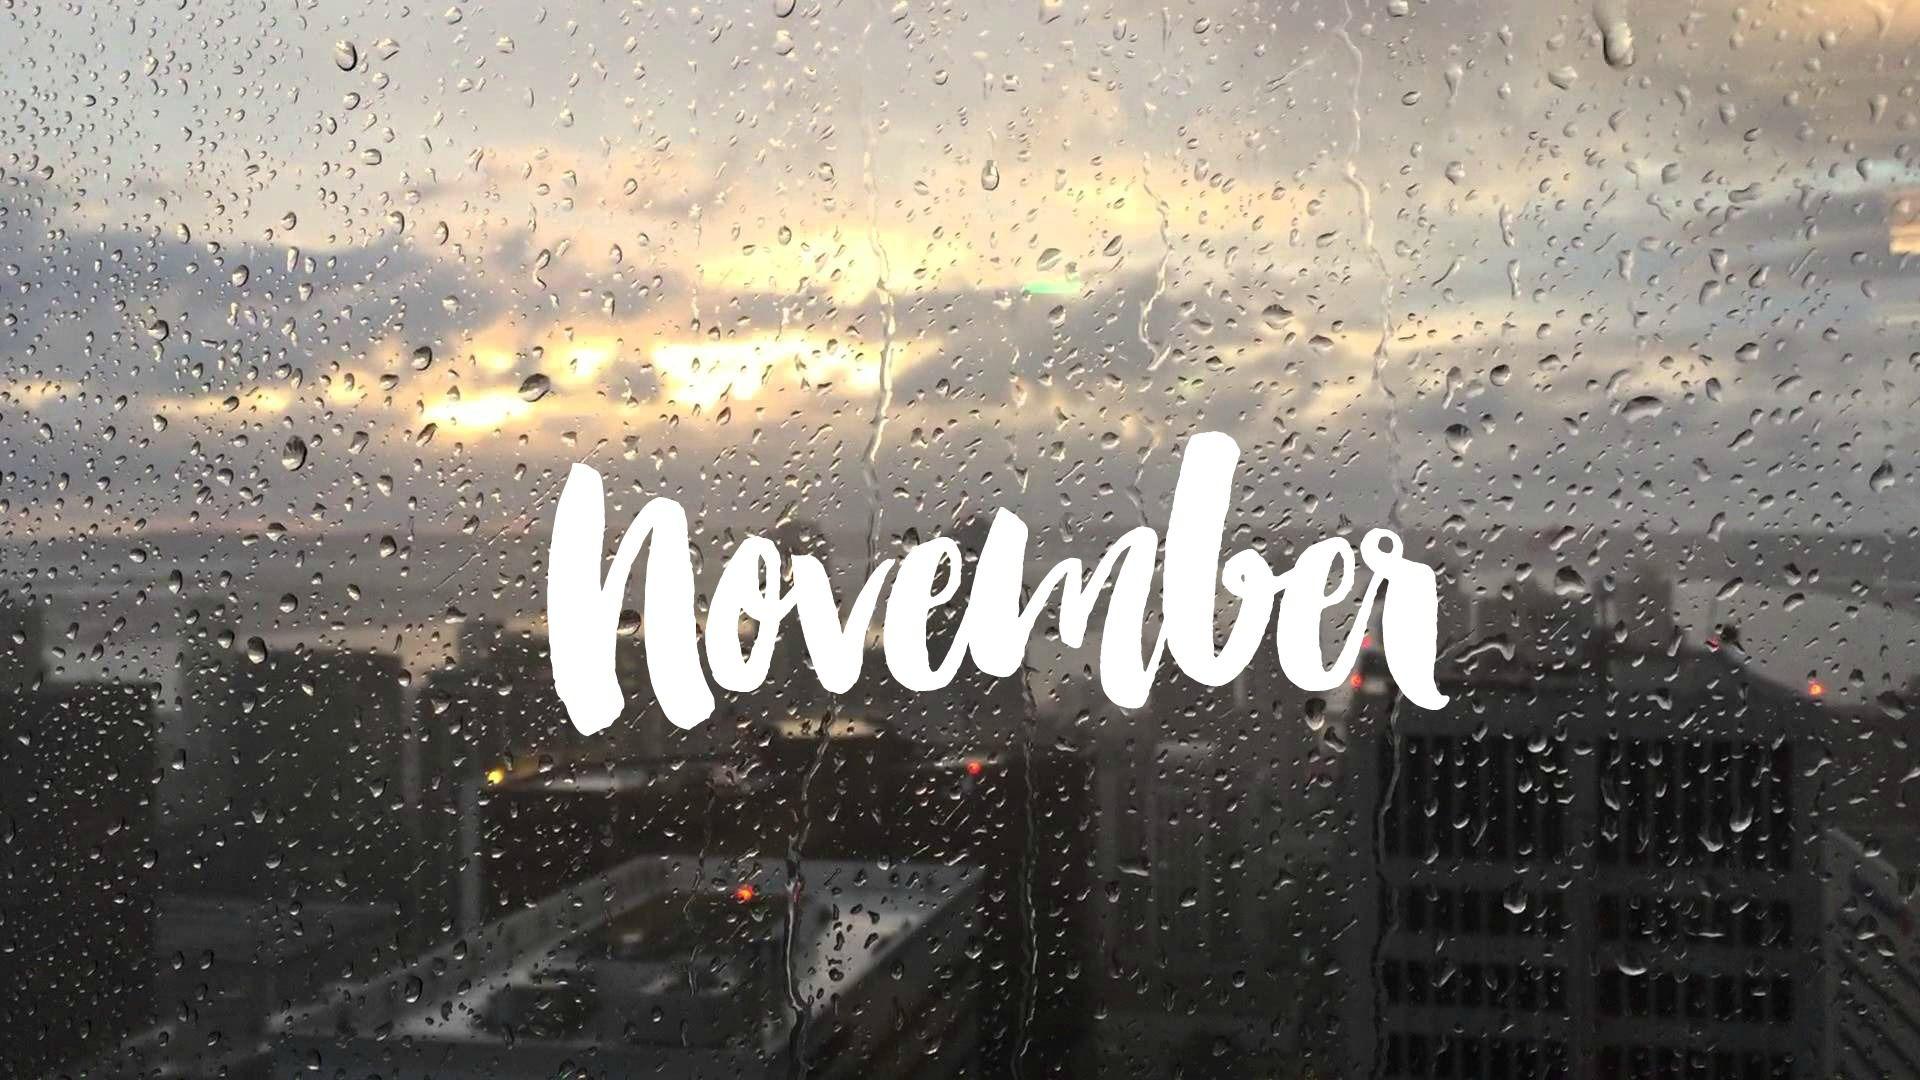 N O V E M B E R november, november quote, image, desktop